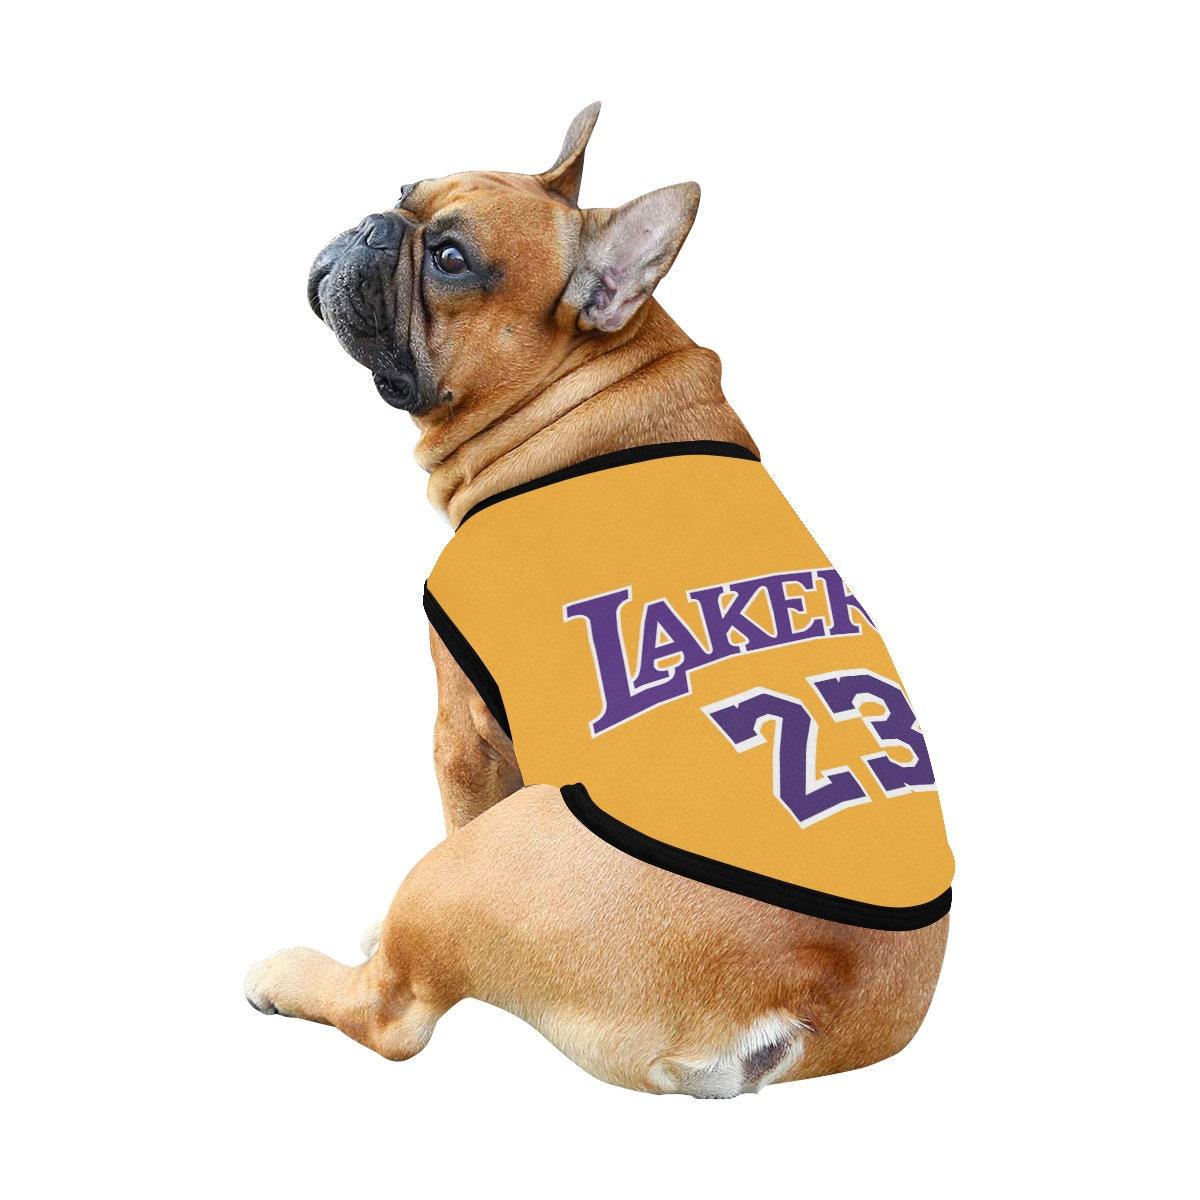 Lakers 23 Lebron James Dog t-shirt, Dog Tank Top, Dog shirt, Dog clothes, Gifts, front back print, 7 sizes XS to 3XL, dog t-shirt yellow